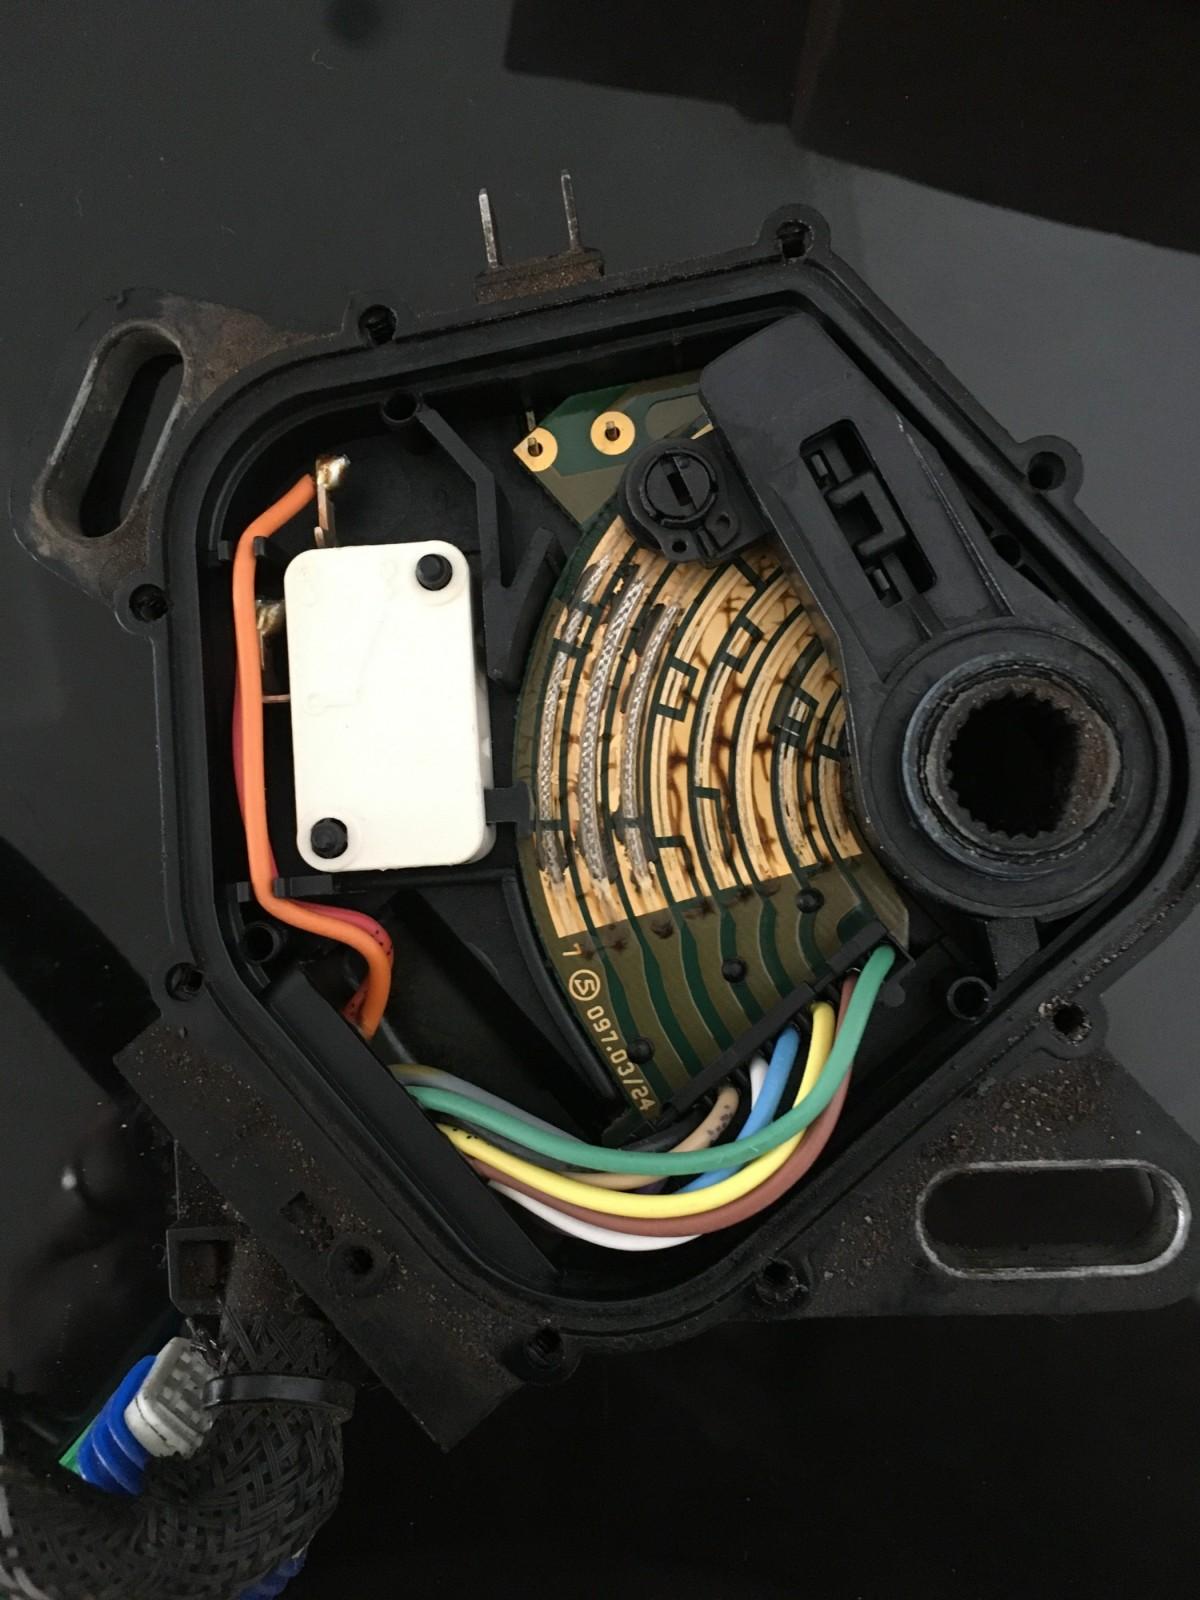 AL4---Chave-seletora-aberta-2.jpg